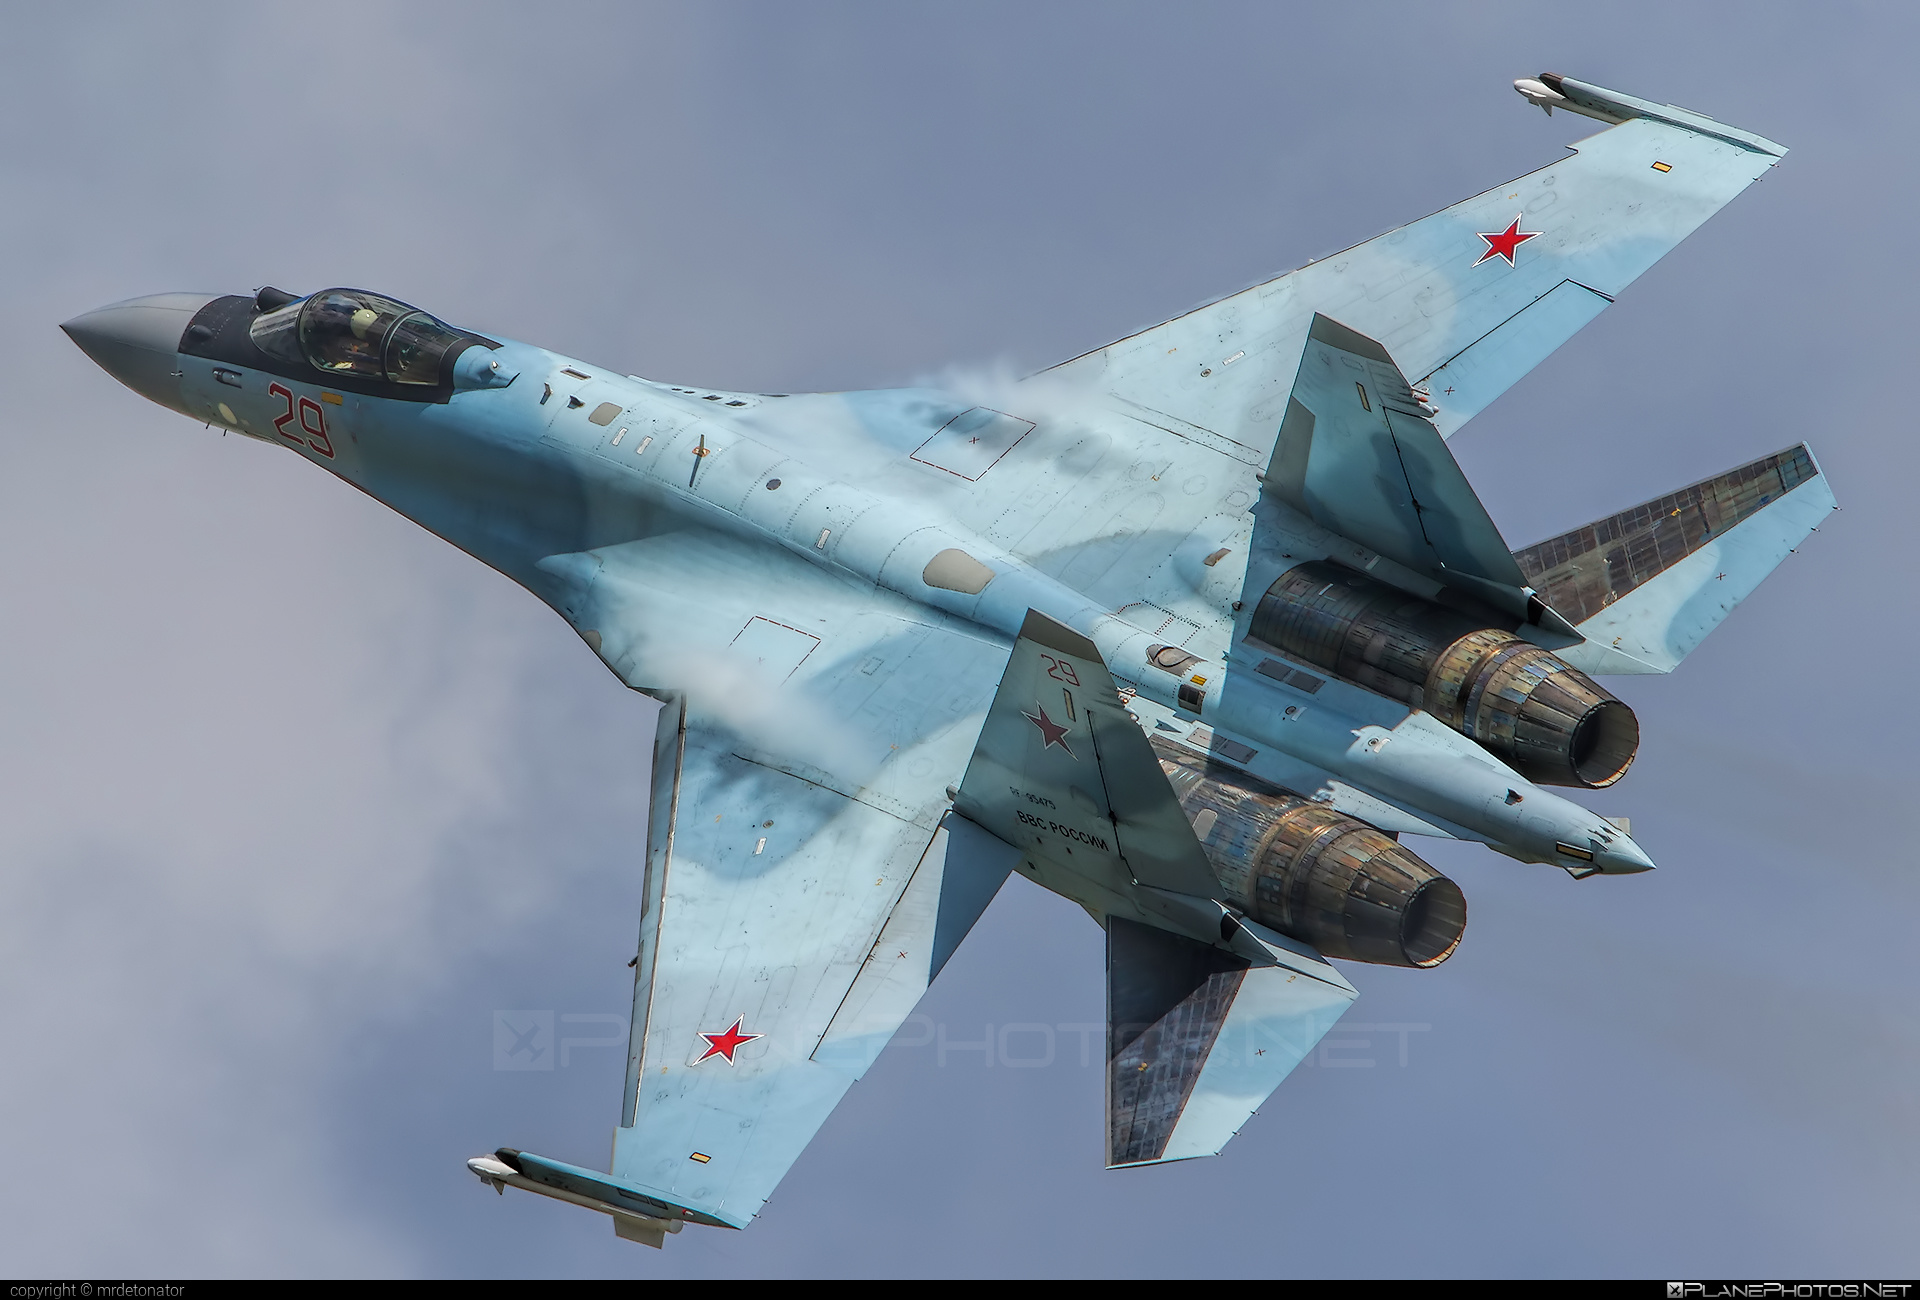 Sukhoi Su-35S - RF-95475 operated by Voyenno-vozdushnye sily Rossii (Russian Air Force) #su35 #su35s #sukhoi #sukhoi35 #sukhoisu35s